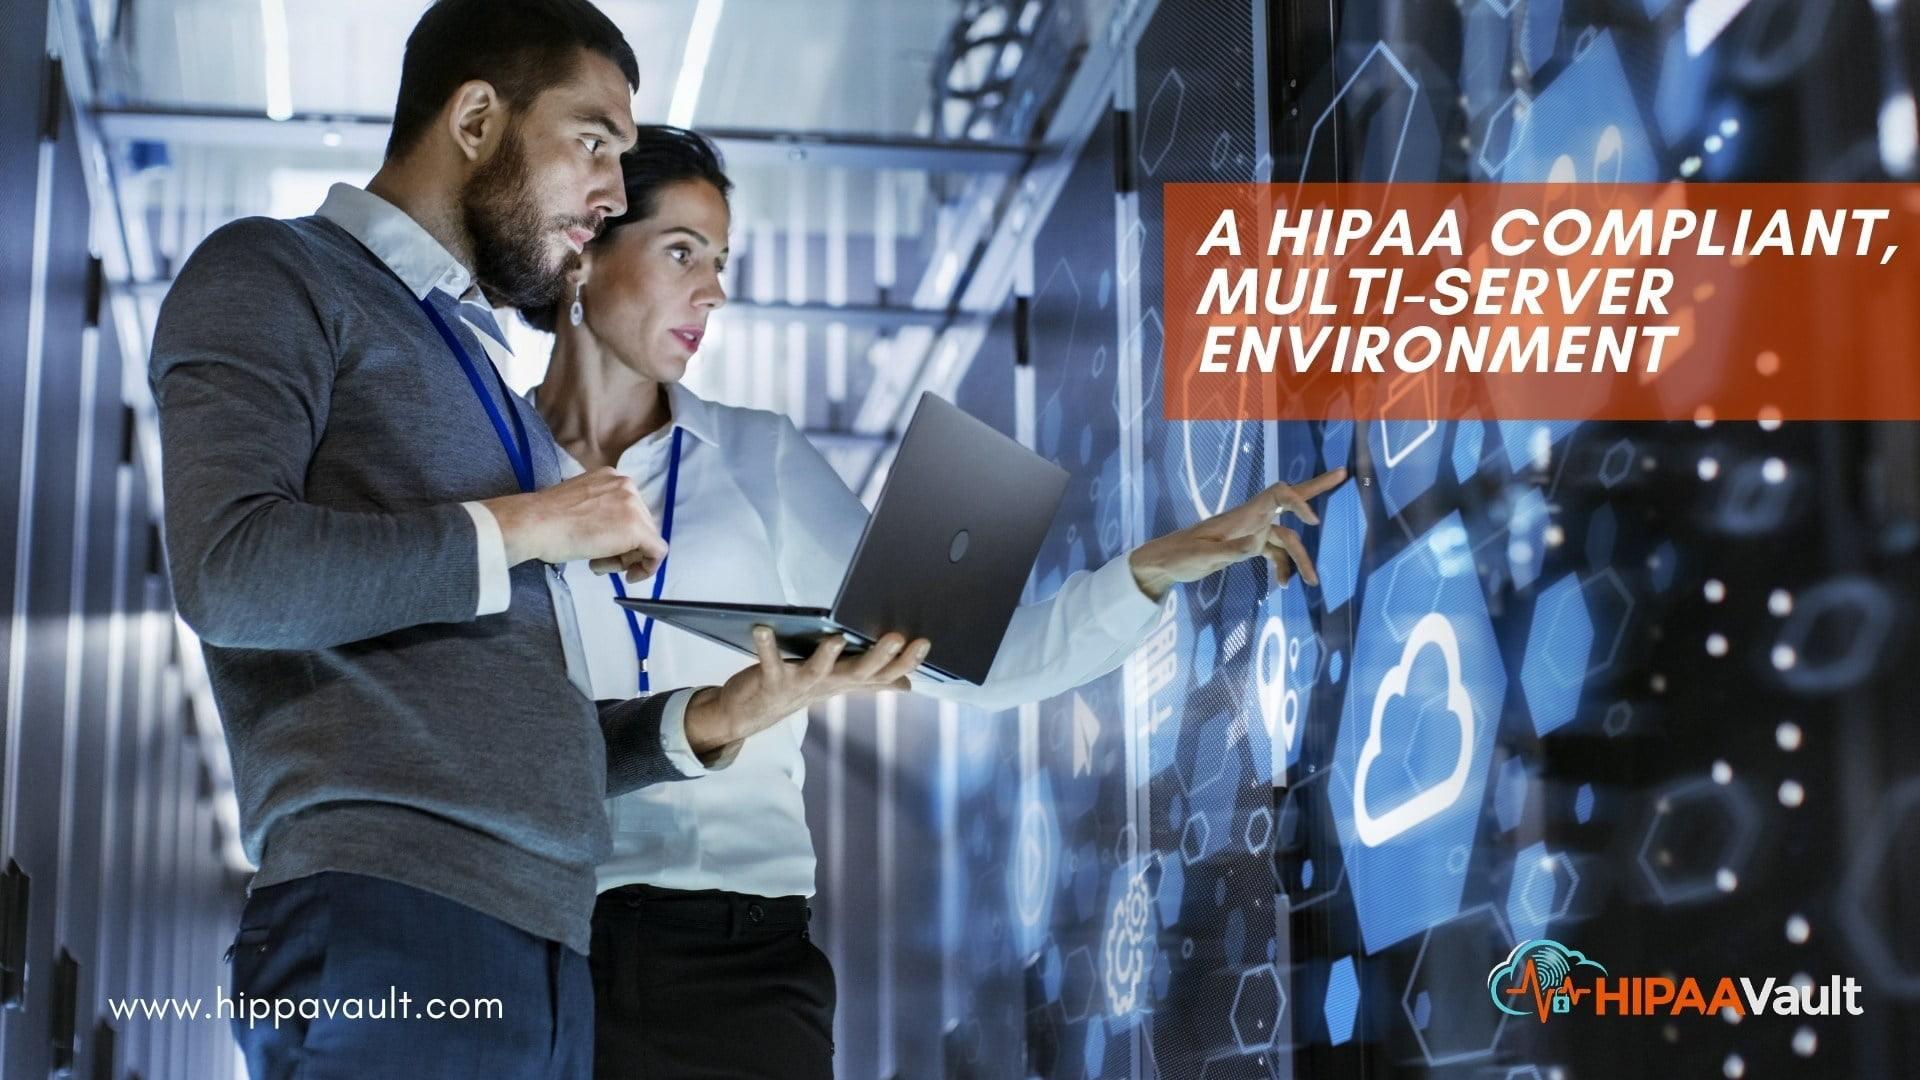 A HIPAA Compliant, Multi-Server Environment